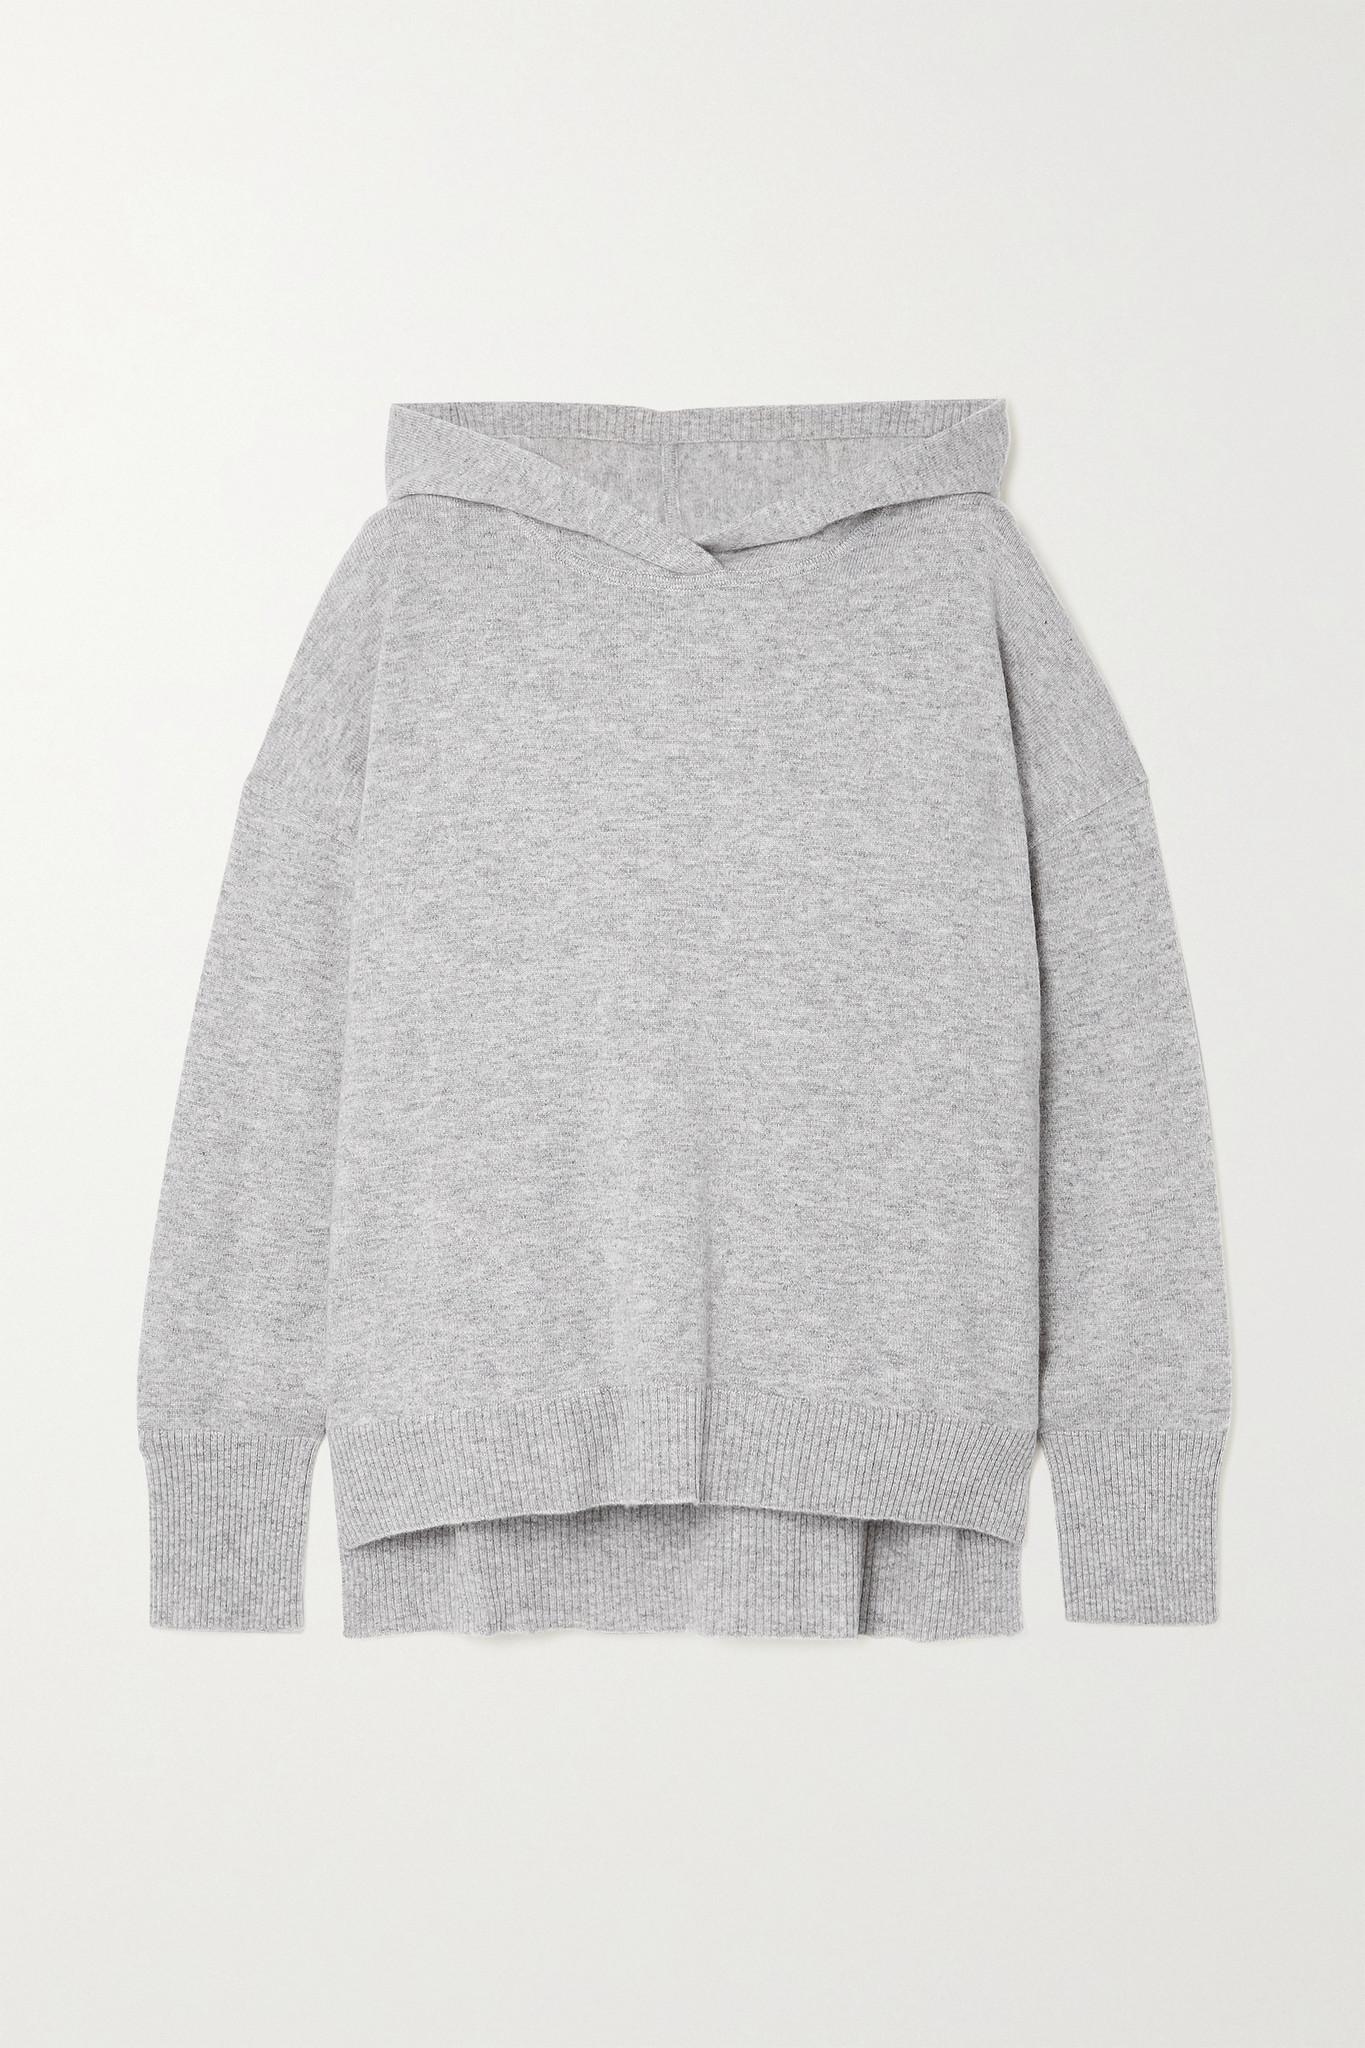 LE KASHA - Riga Cashmere Hoodie - Gray - medium